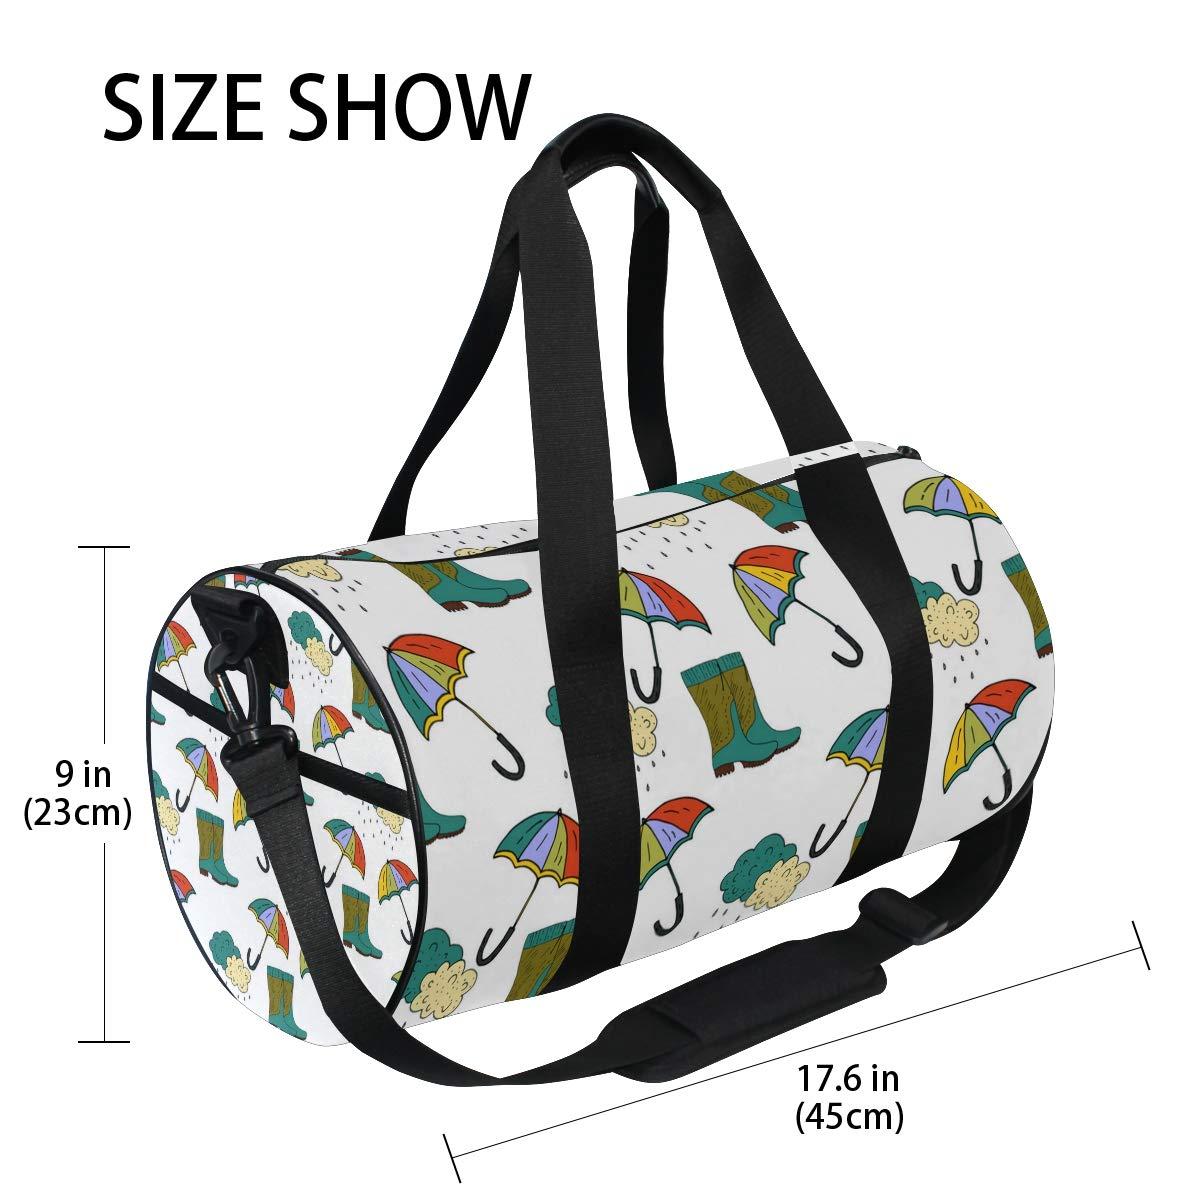 Rain Boots UmbrellaWaterproof Non-Slip Wearable Crossbody Bag fitness bag Shoulder Bag